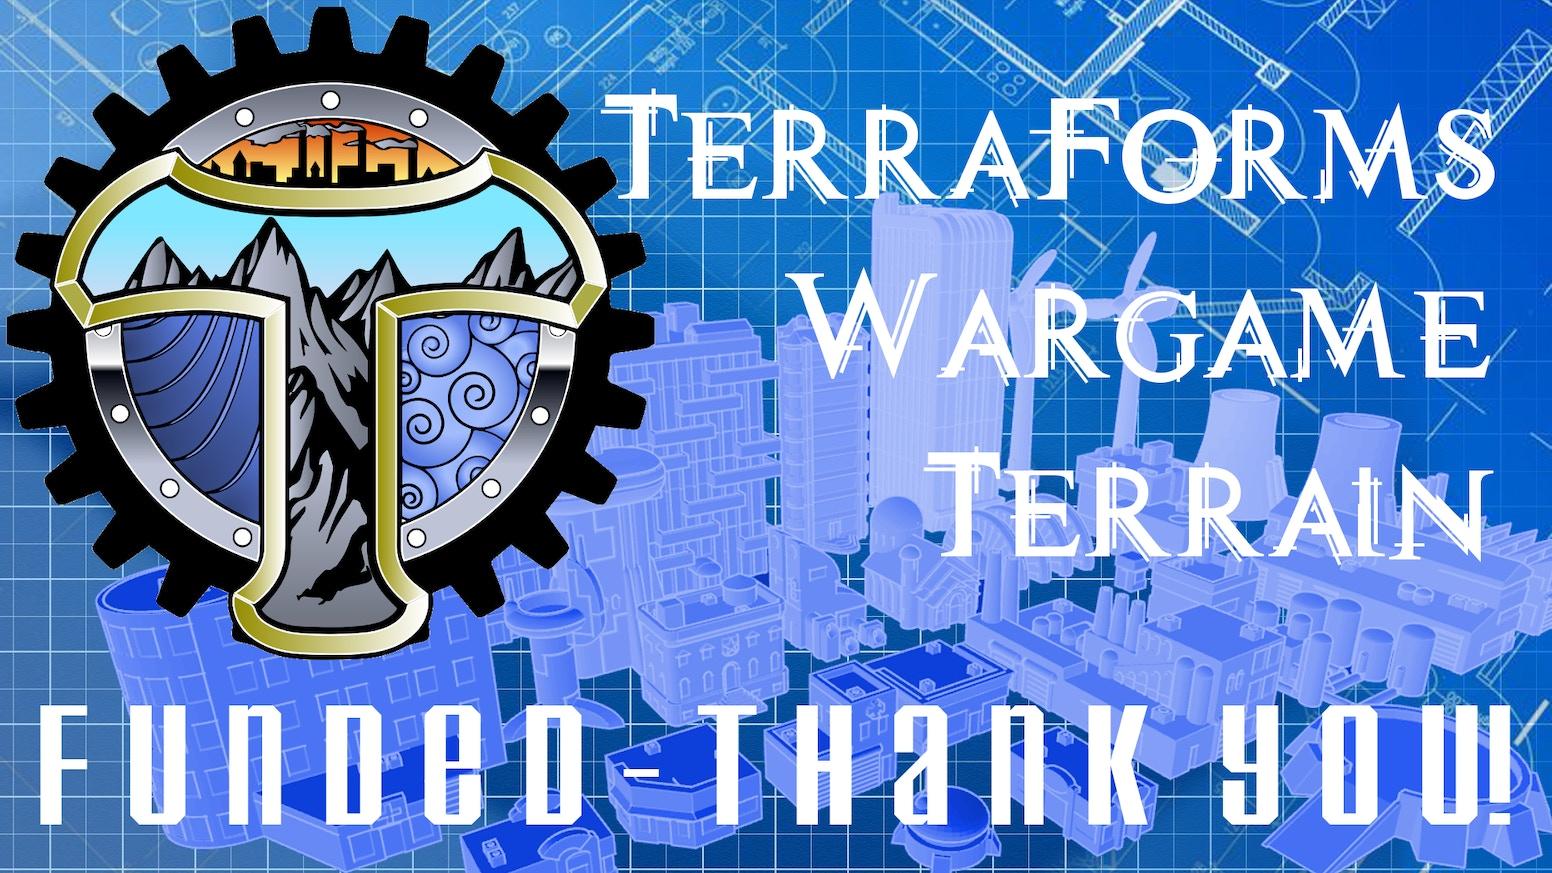 TerraForms Tabletop Wargame Terrain 10mm/12mm scale by James Hampton